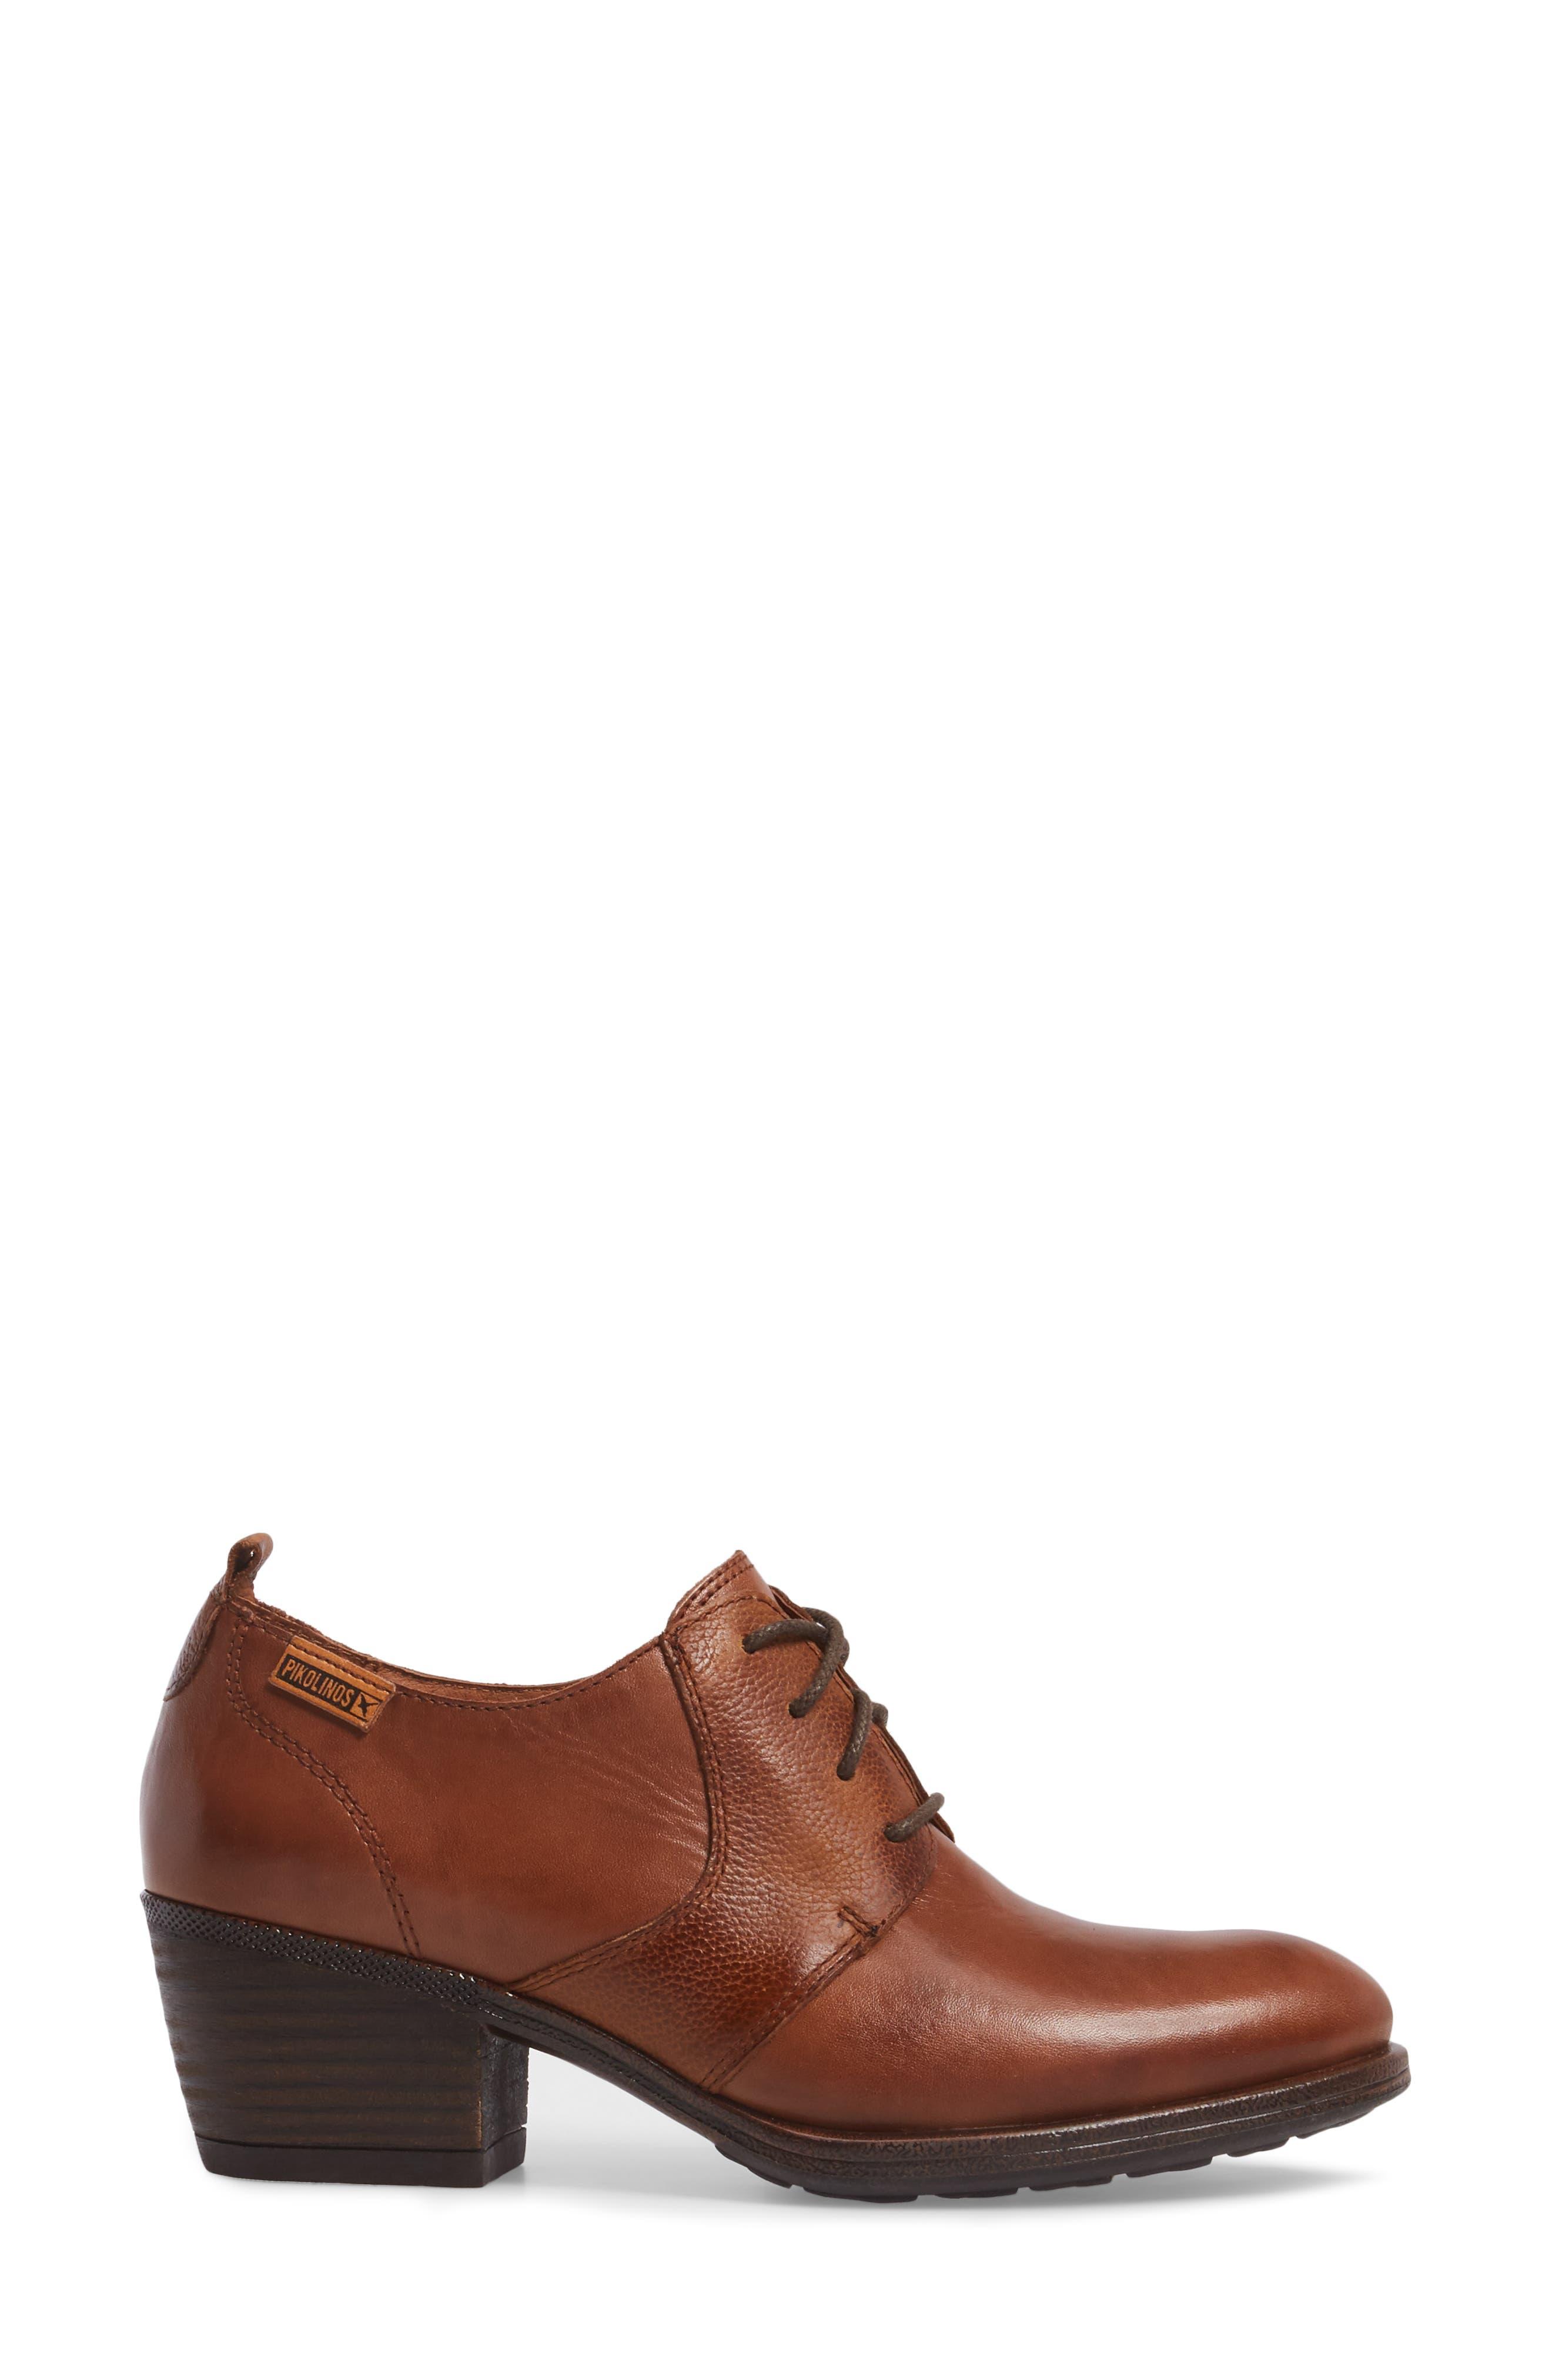 Baqueira Oxford Pump,                             Alternate thumbnail 3, color,                             Cuero Brandy Leather